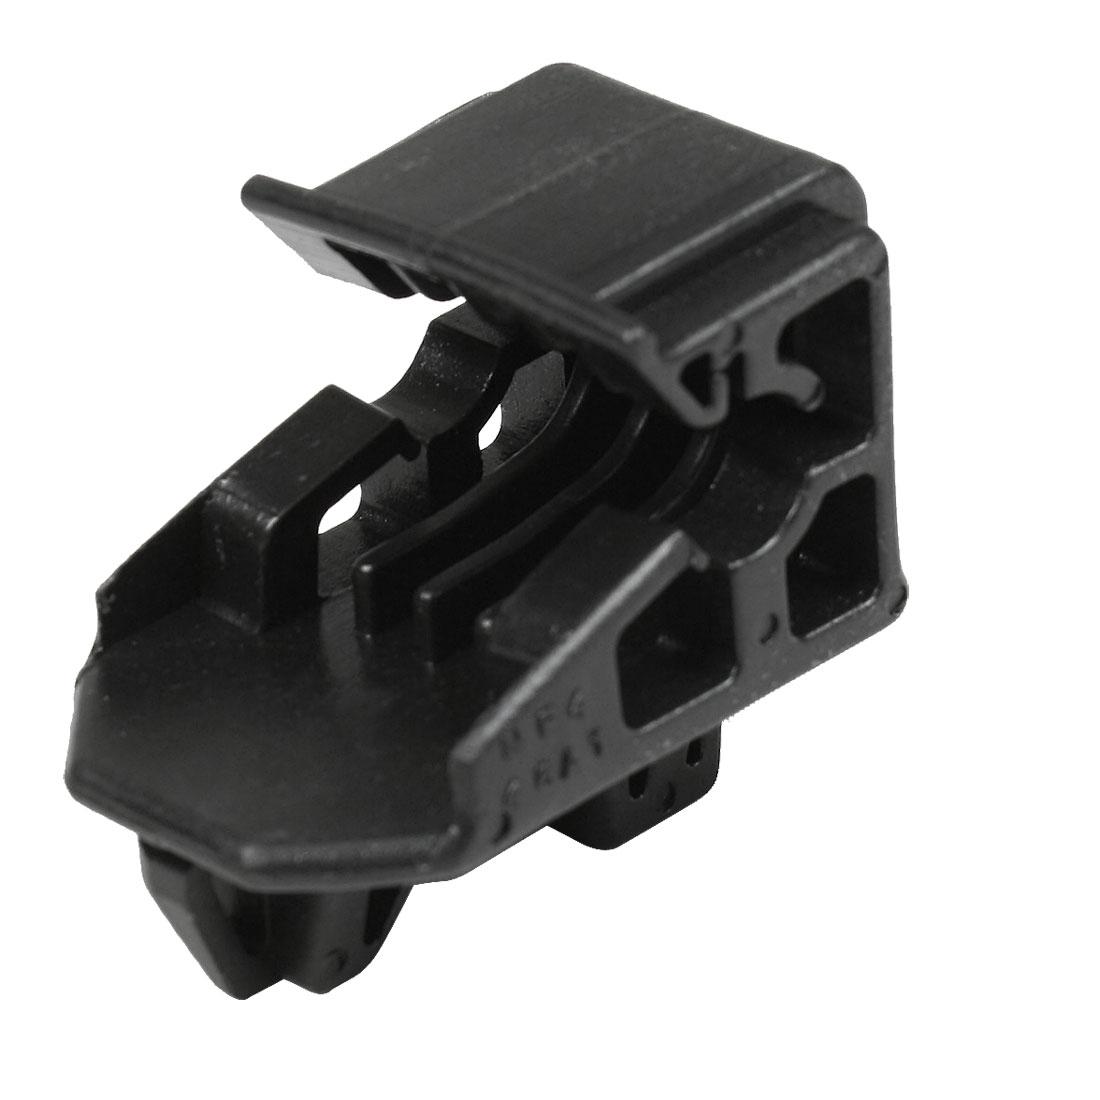 Black Plastic Car Headlight Lamp Bracket Clip 53271-44010